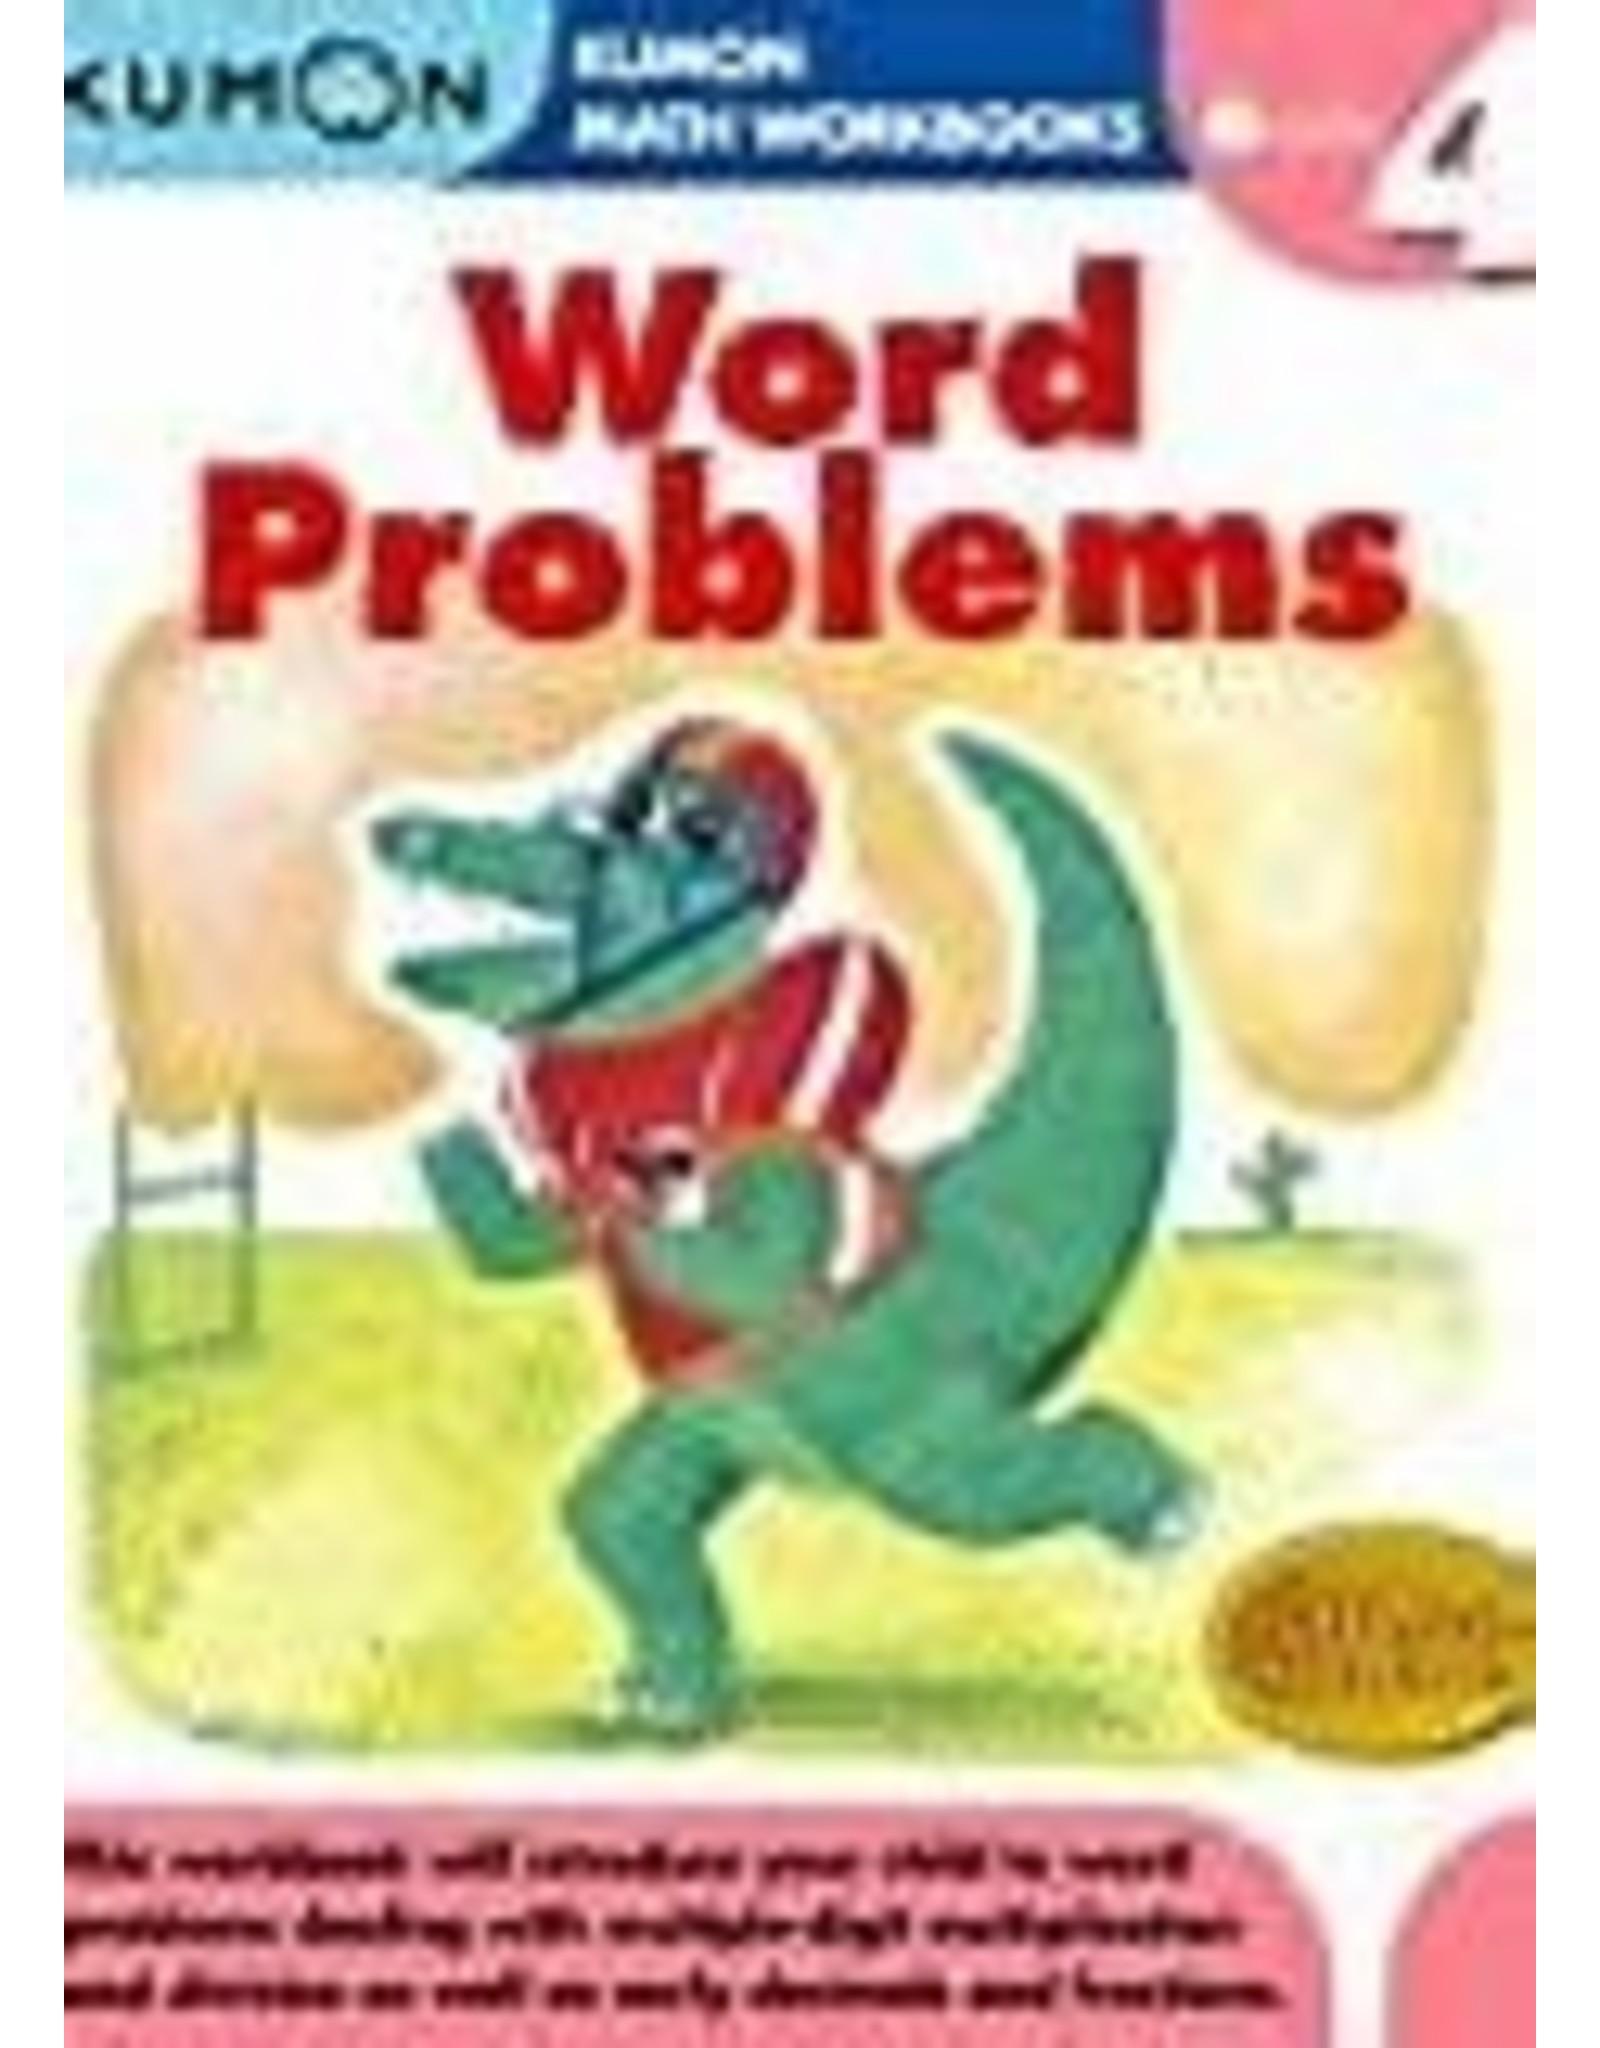 Kumon GRADE 4 WORD PROBLEMS